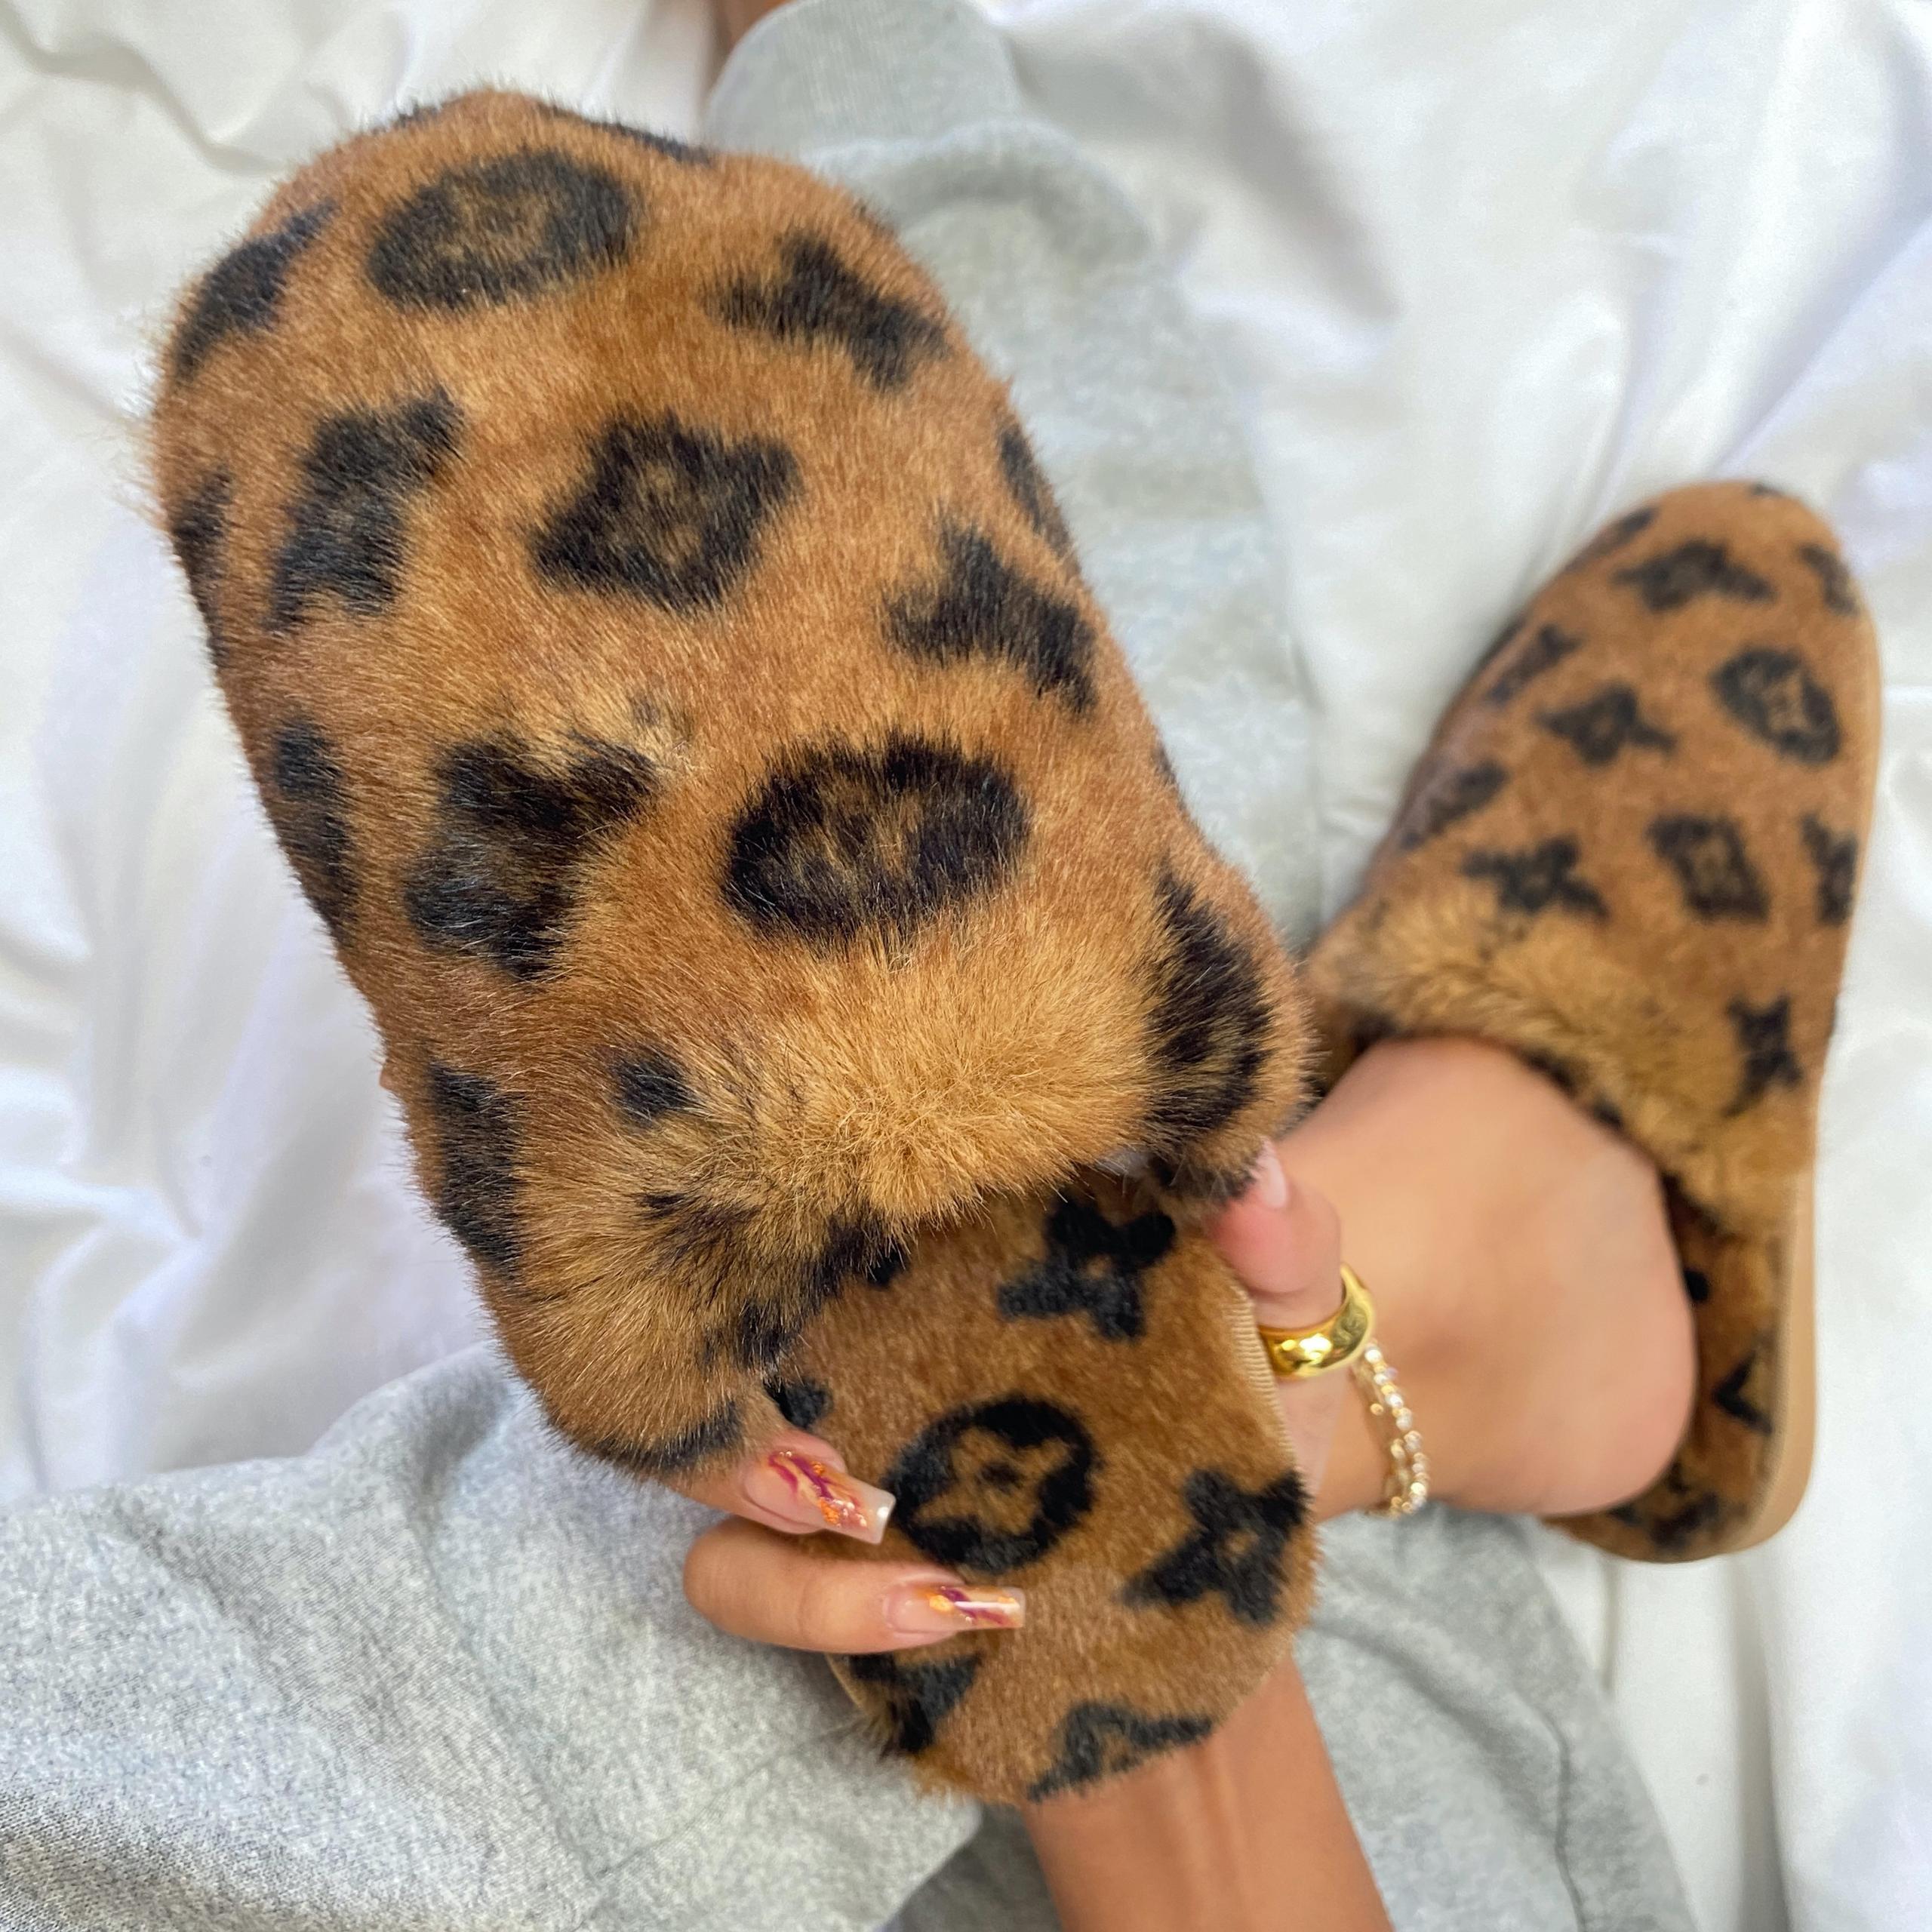 EGO Kulture Fluffy Printed Detail Flat Slipper In Tan Brown Faux Fur, Brown  - female - Size: 10